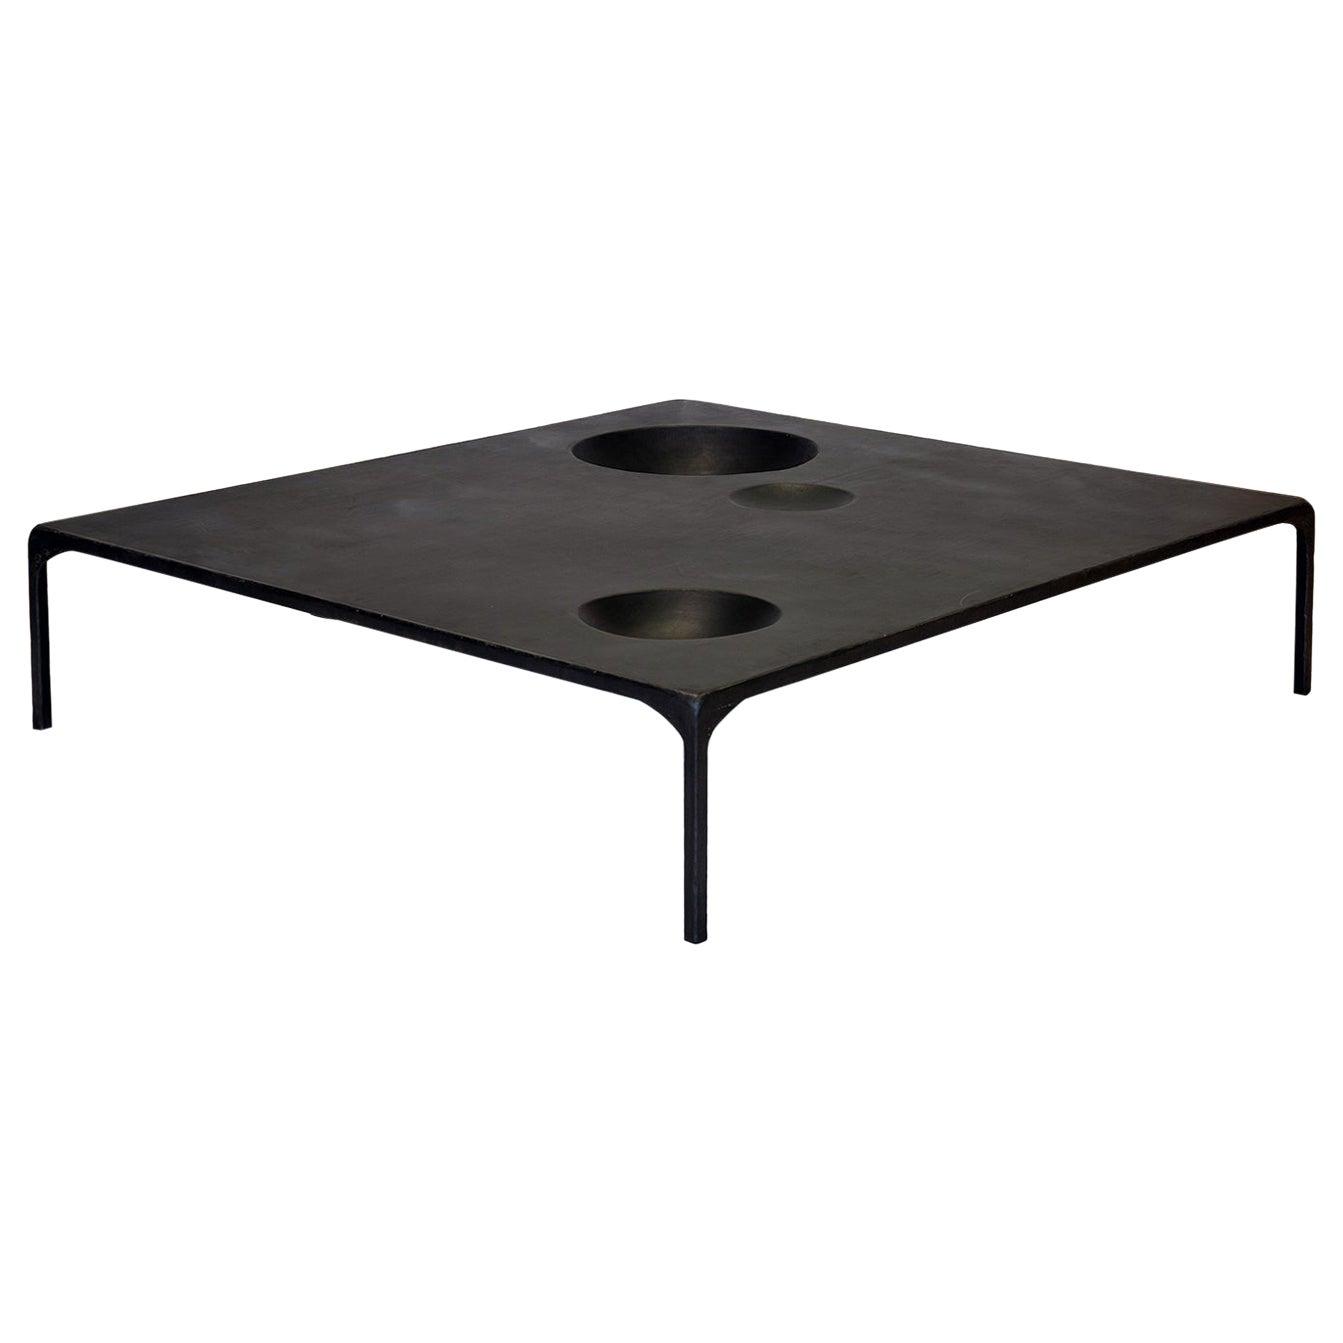 Coffee Table Monumental Modern Handmade Geometric Blackened Steel Large Waxed